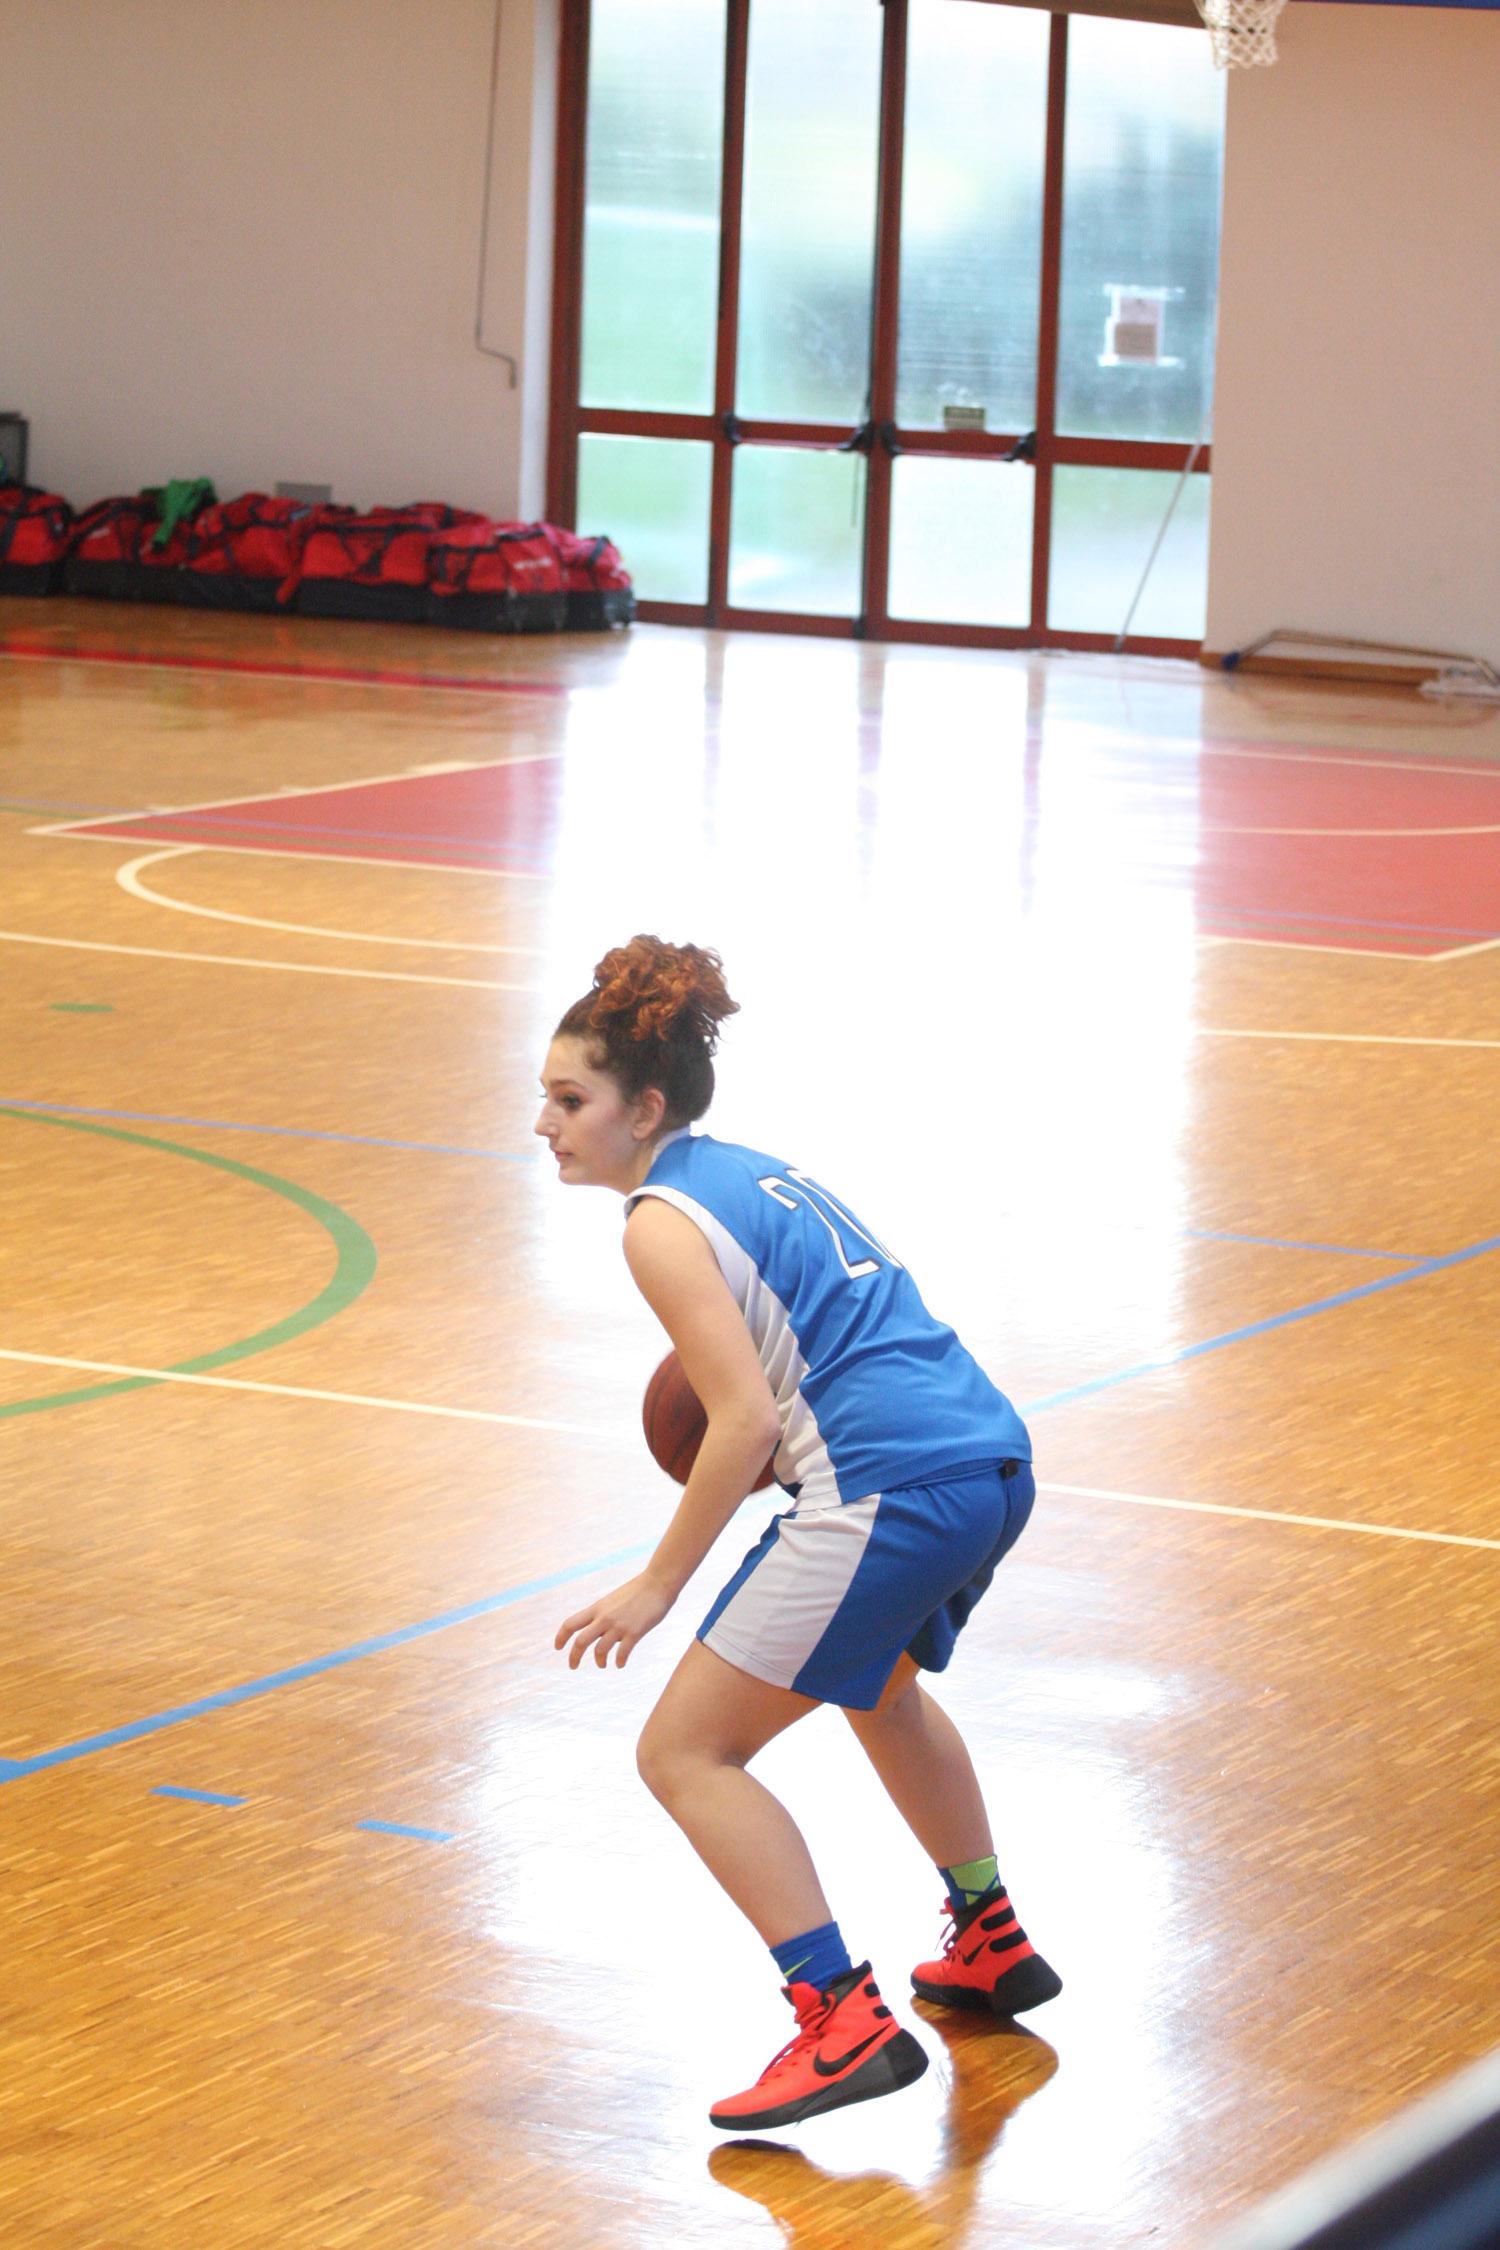 U16E - Costa Masnaga vs Baskettiamo Vittuone 2001 00005.jpg